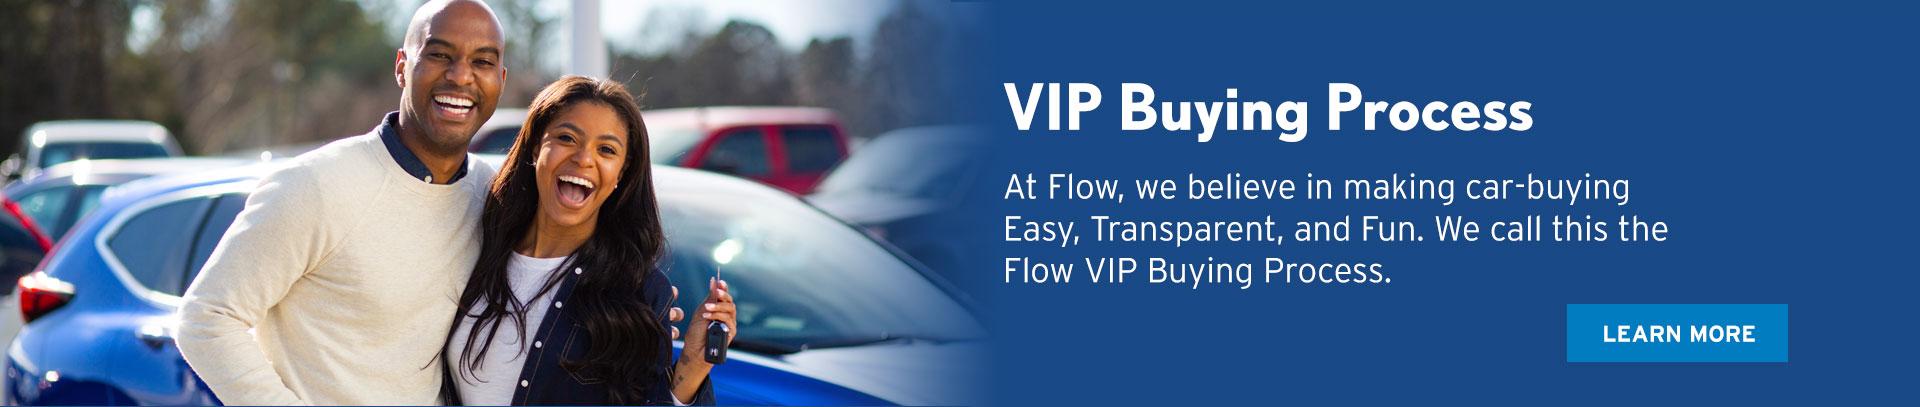 Flow VIP Buying Process